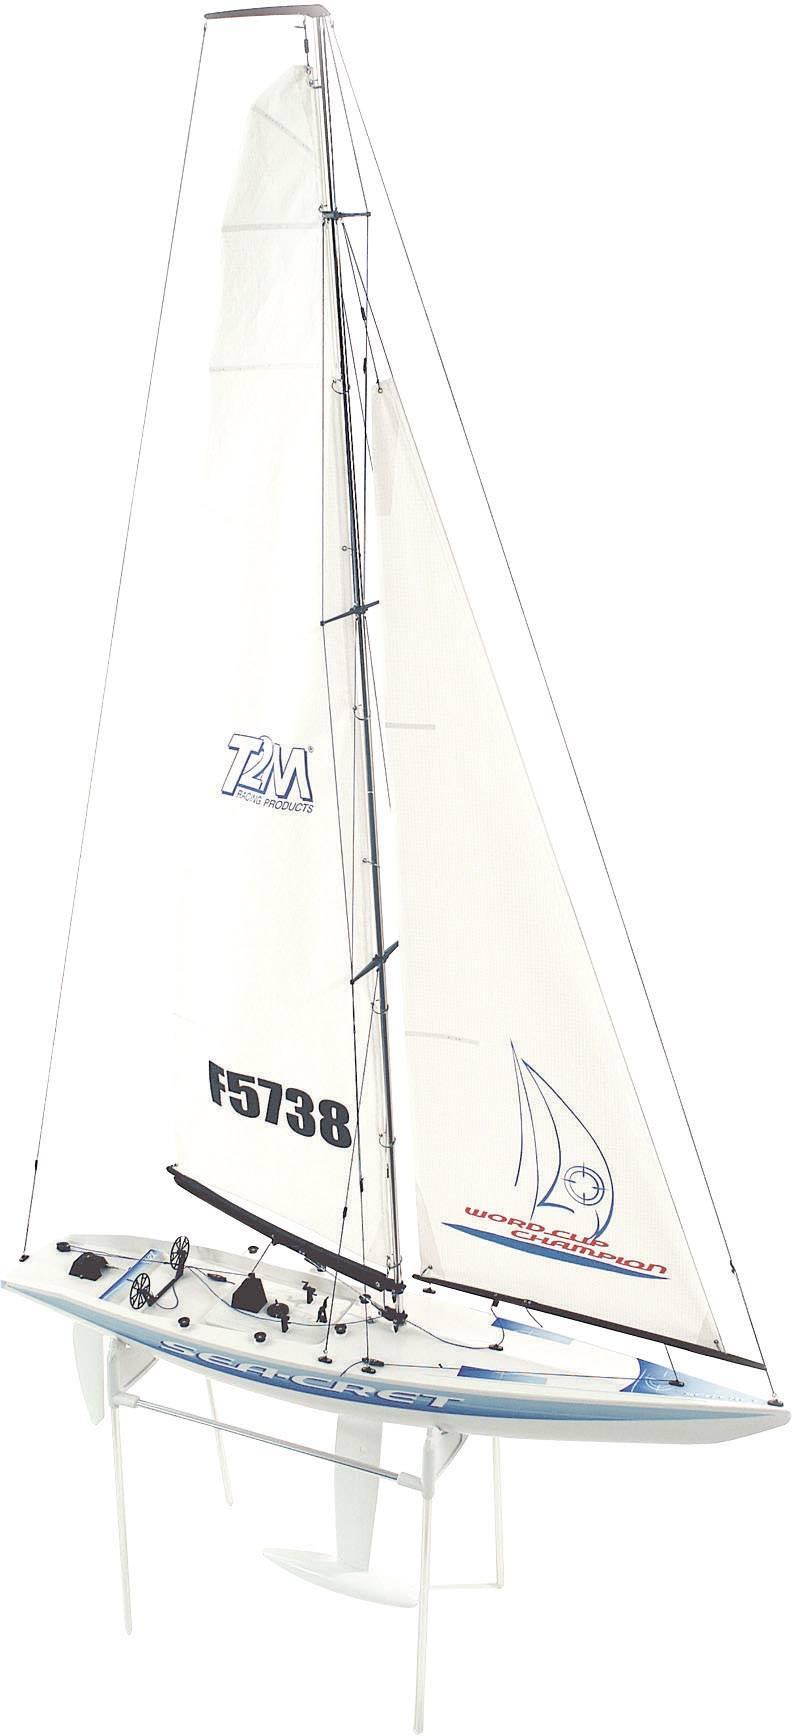 RC model plachetnice T2M Sea-Cret, BS, 914 mm